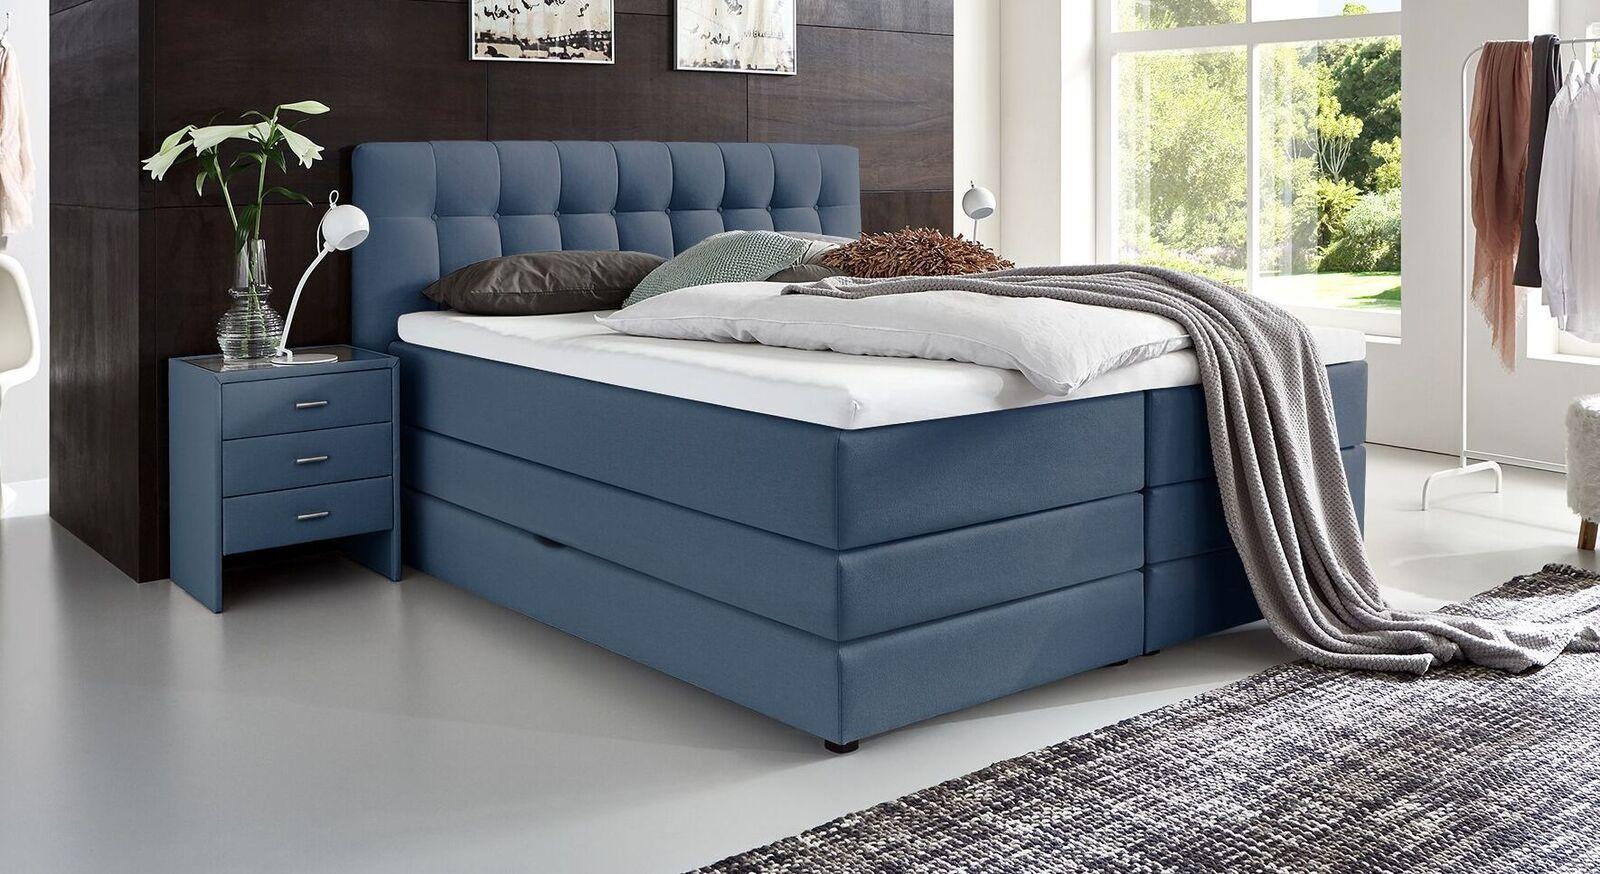 Bettkasten-Boxspringbett Luciano mit Stoffbezug in Blau